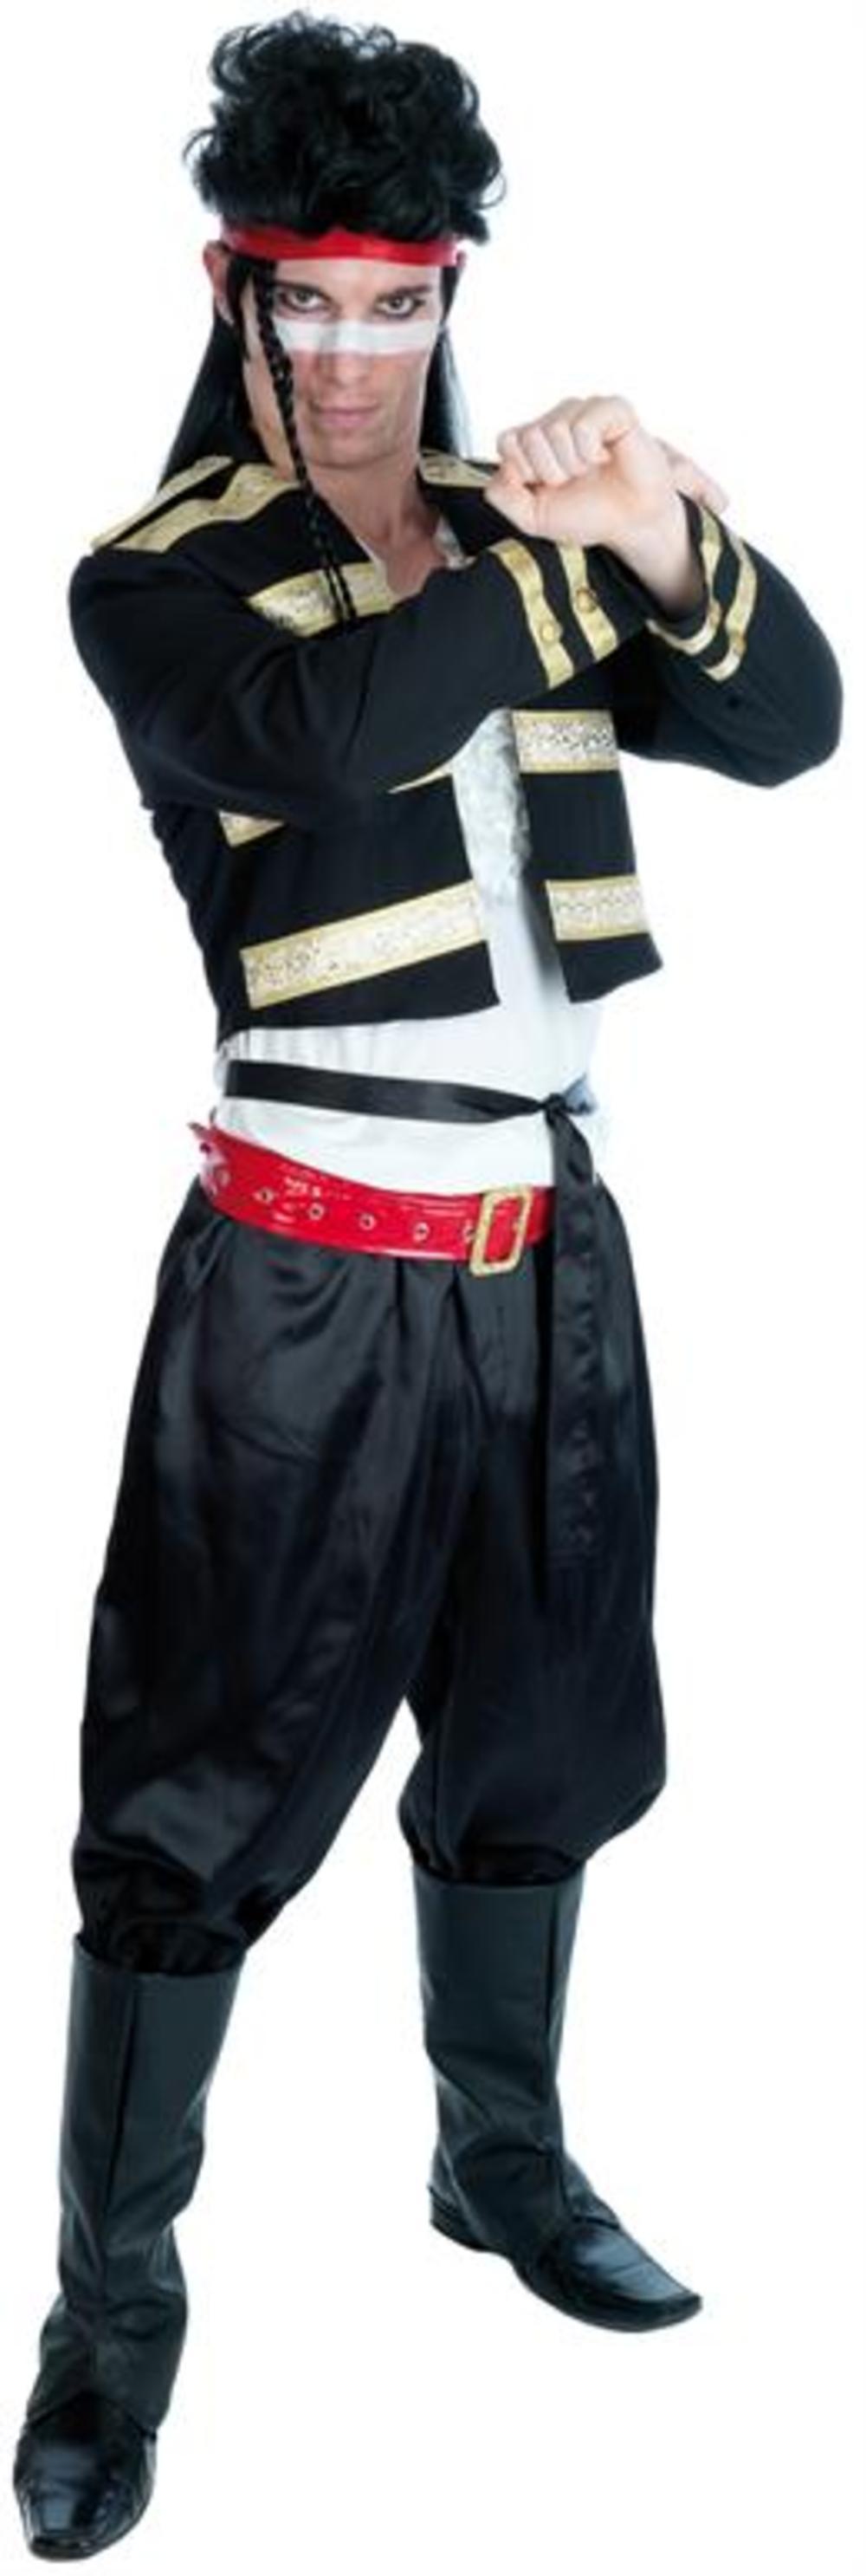 Adam Ant Pop 80s Star Adult Fancy Dress Mens Celebrity 1980s Prince Costume New